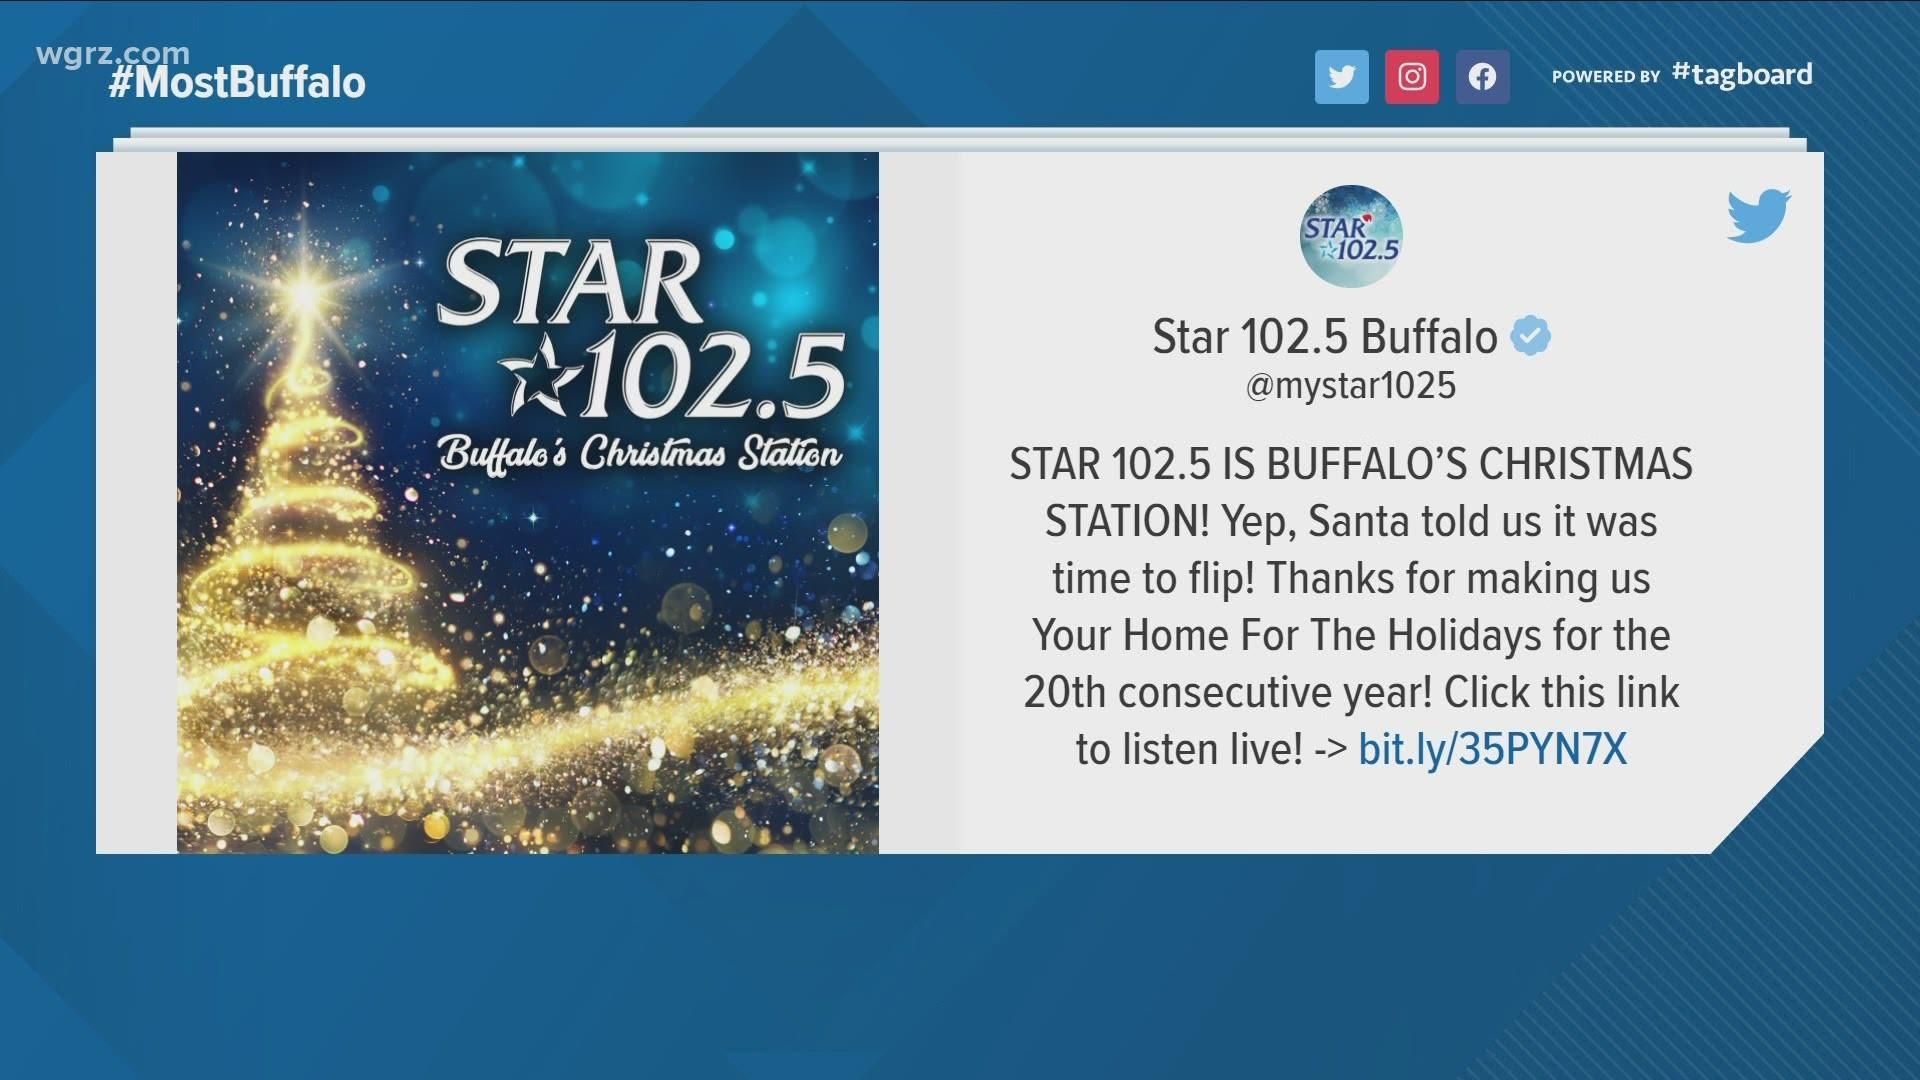 Christmas Radio Stations Indianapolis 2020 Star 102.5 now playing Christmas music   wthr.com